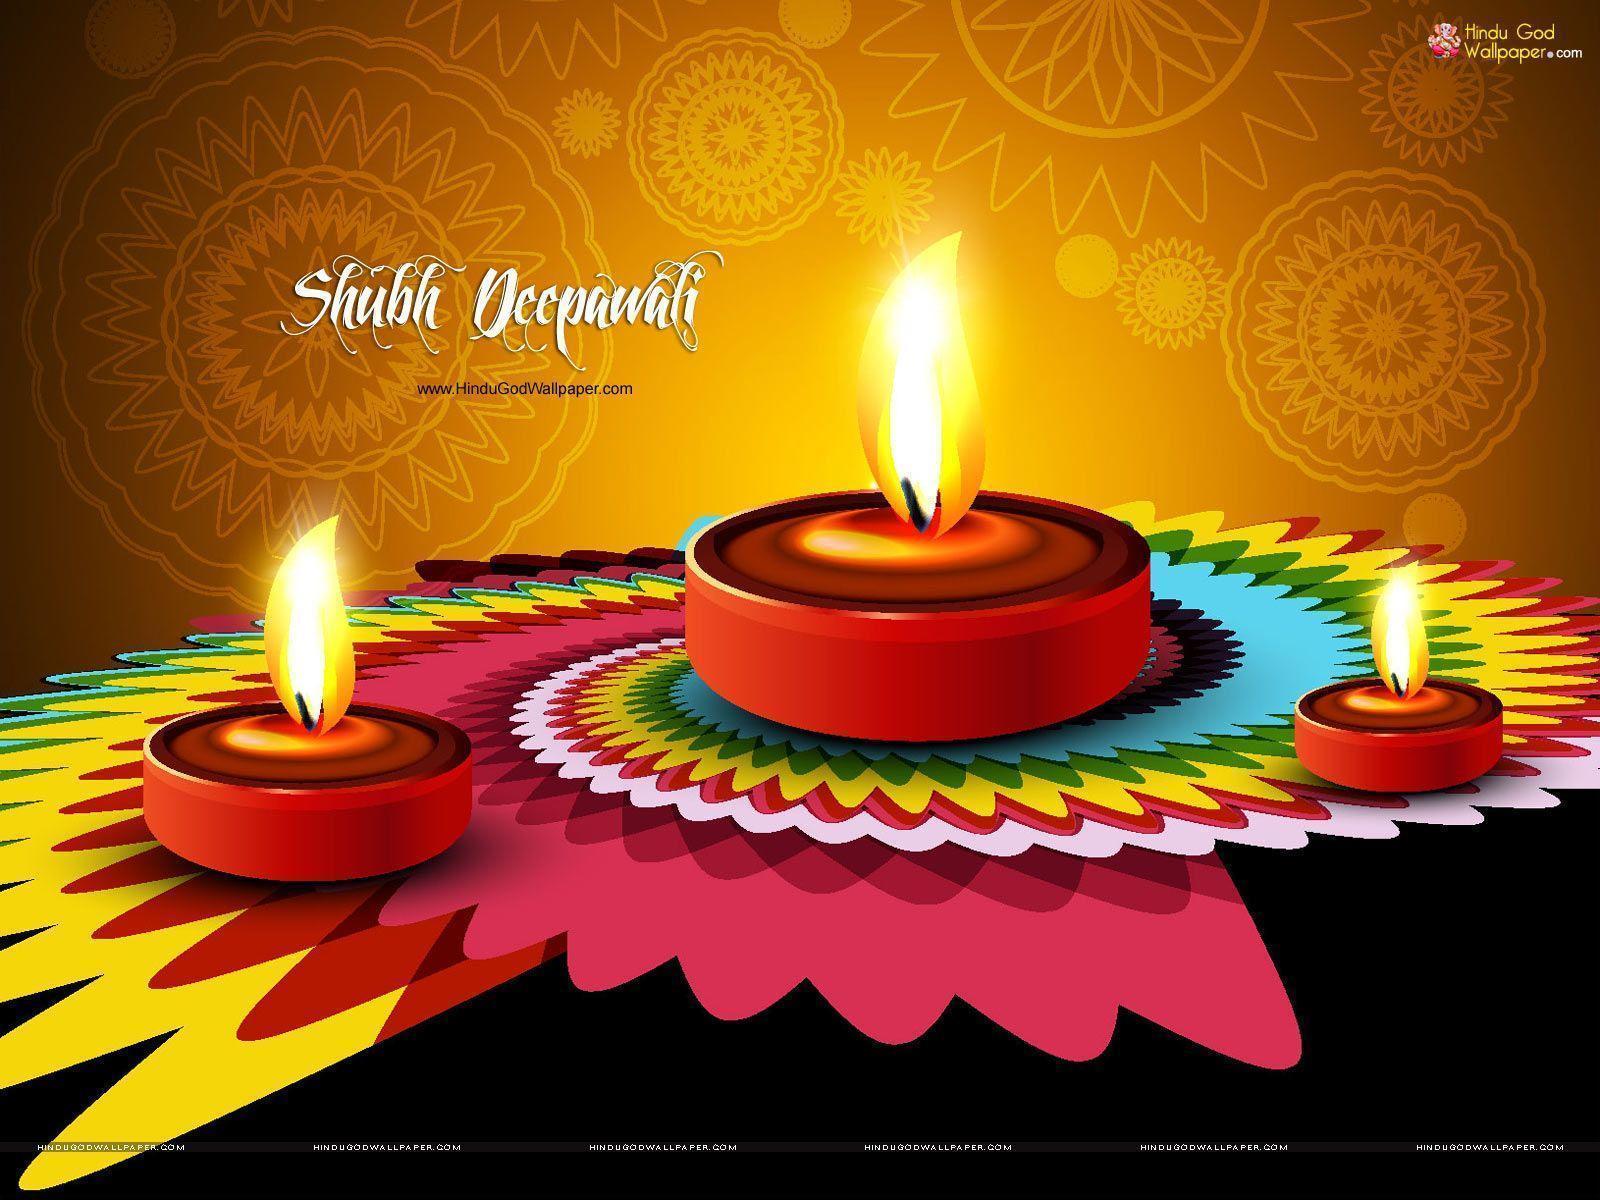 Diwali Wallpaper 2016: Download Free & Latest HD Diwali Wallpapers ...